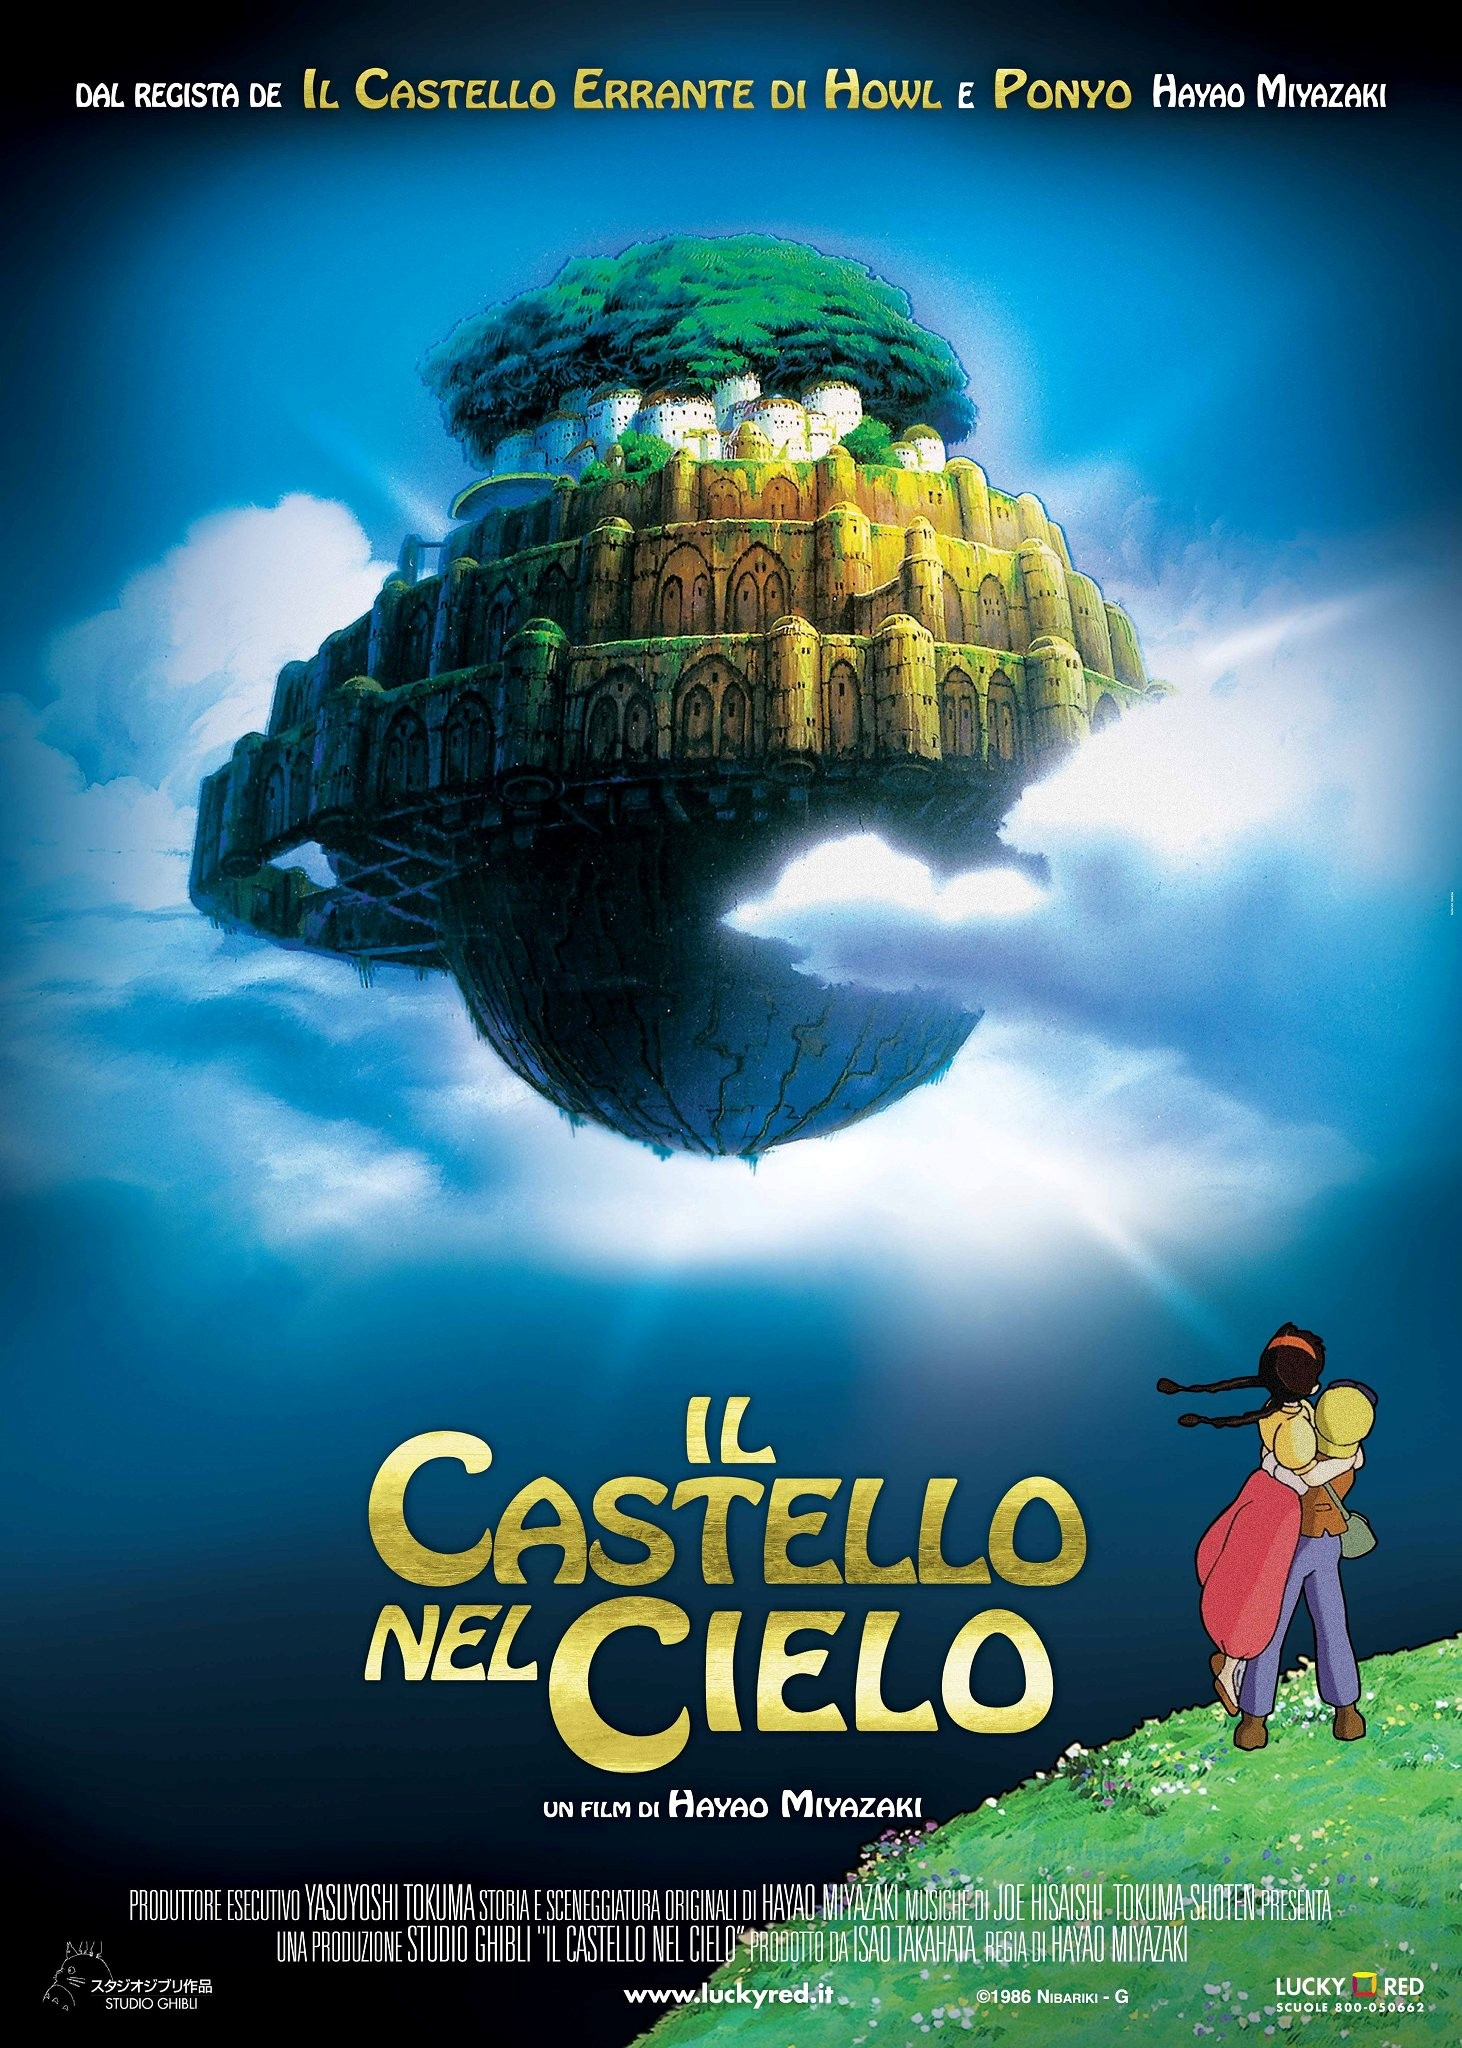 Castello nel cielo, laputa, locandina, italia